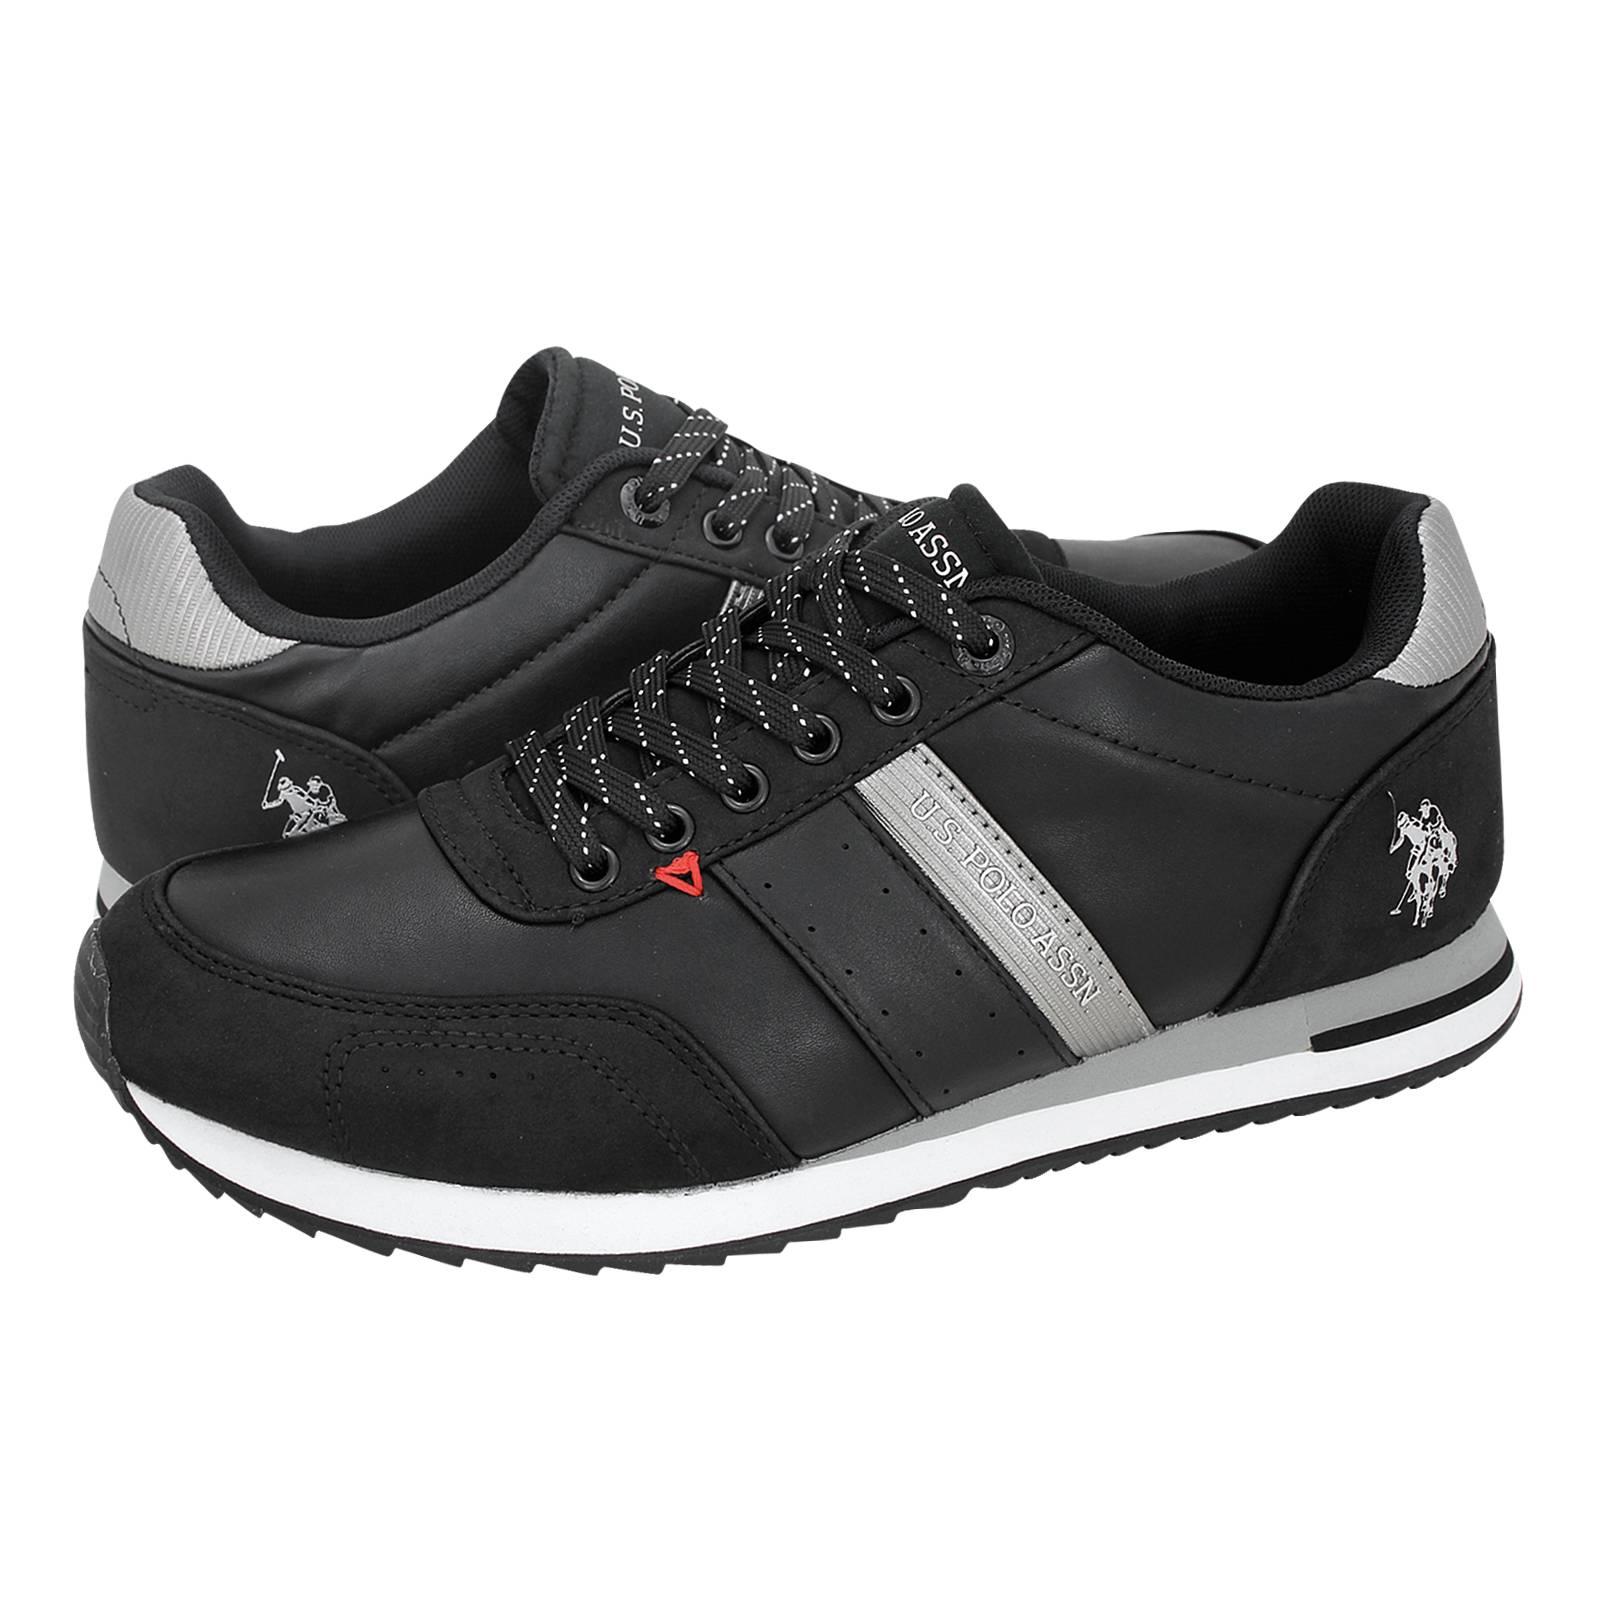 a4229331aa1 Vance - Ανδρικά παπούτσια casual U.S. Polo ASSN από δερμα συνθετικο ...